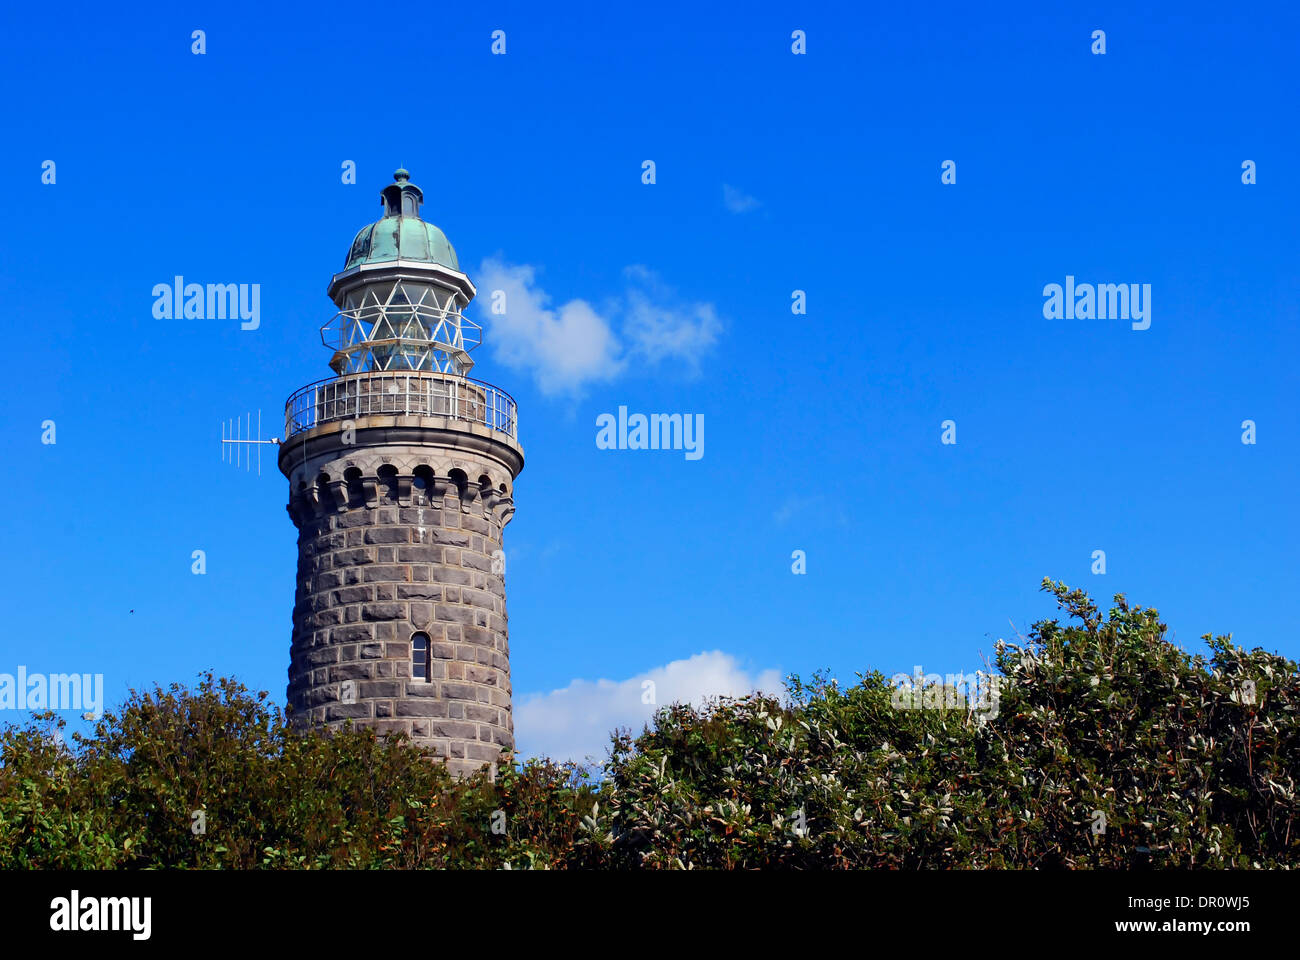 aero skjoldnaes lighthouse fyn denmark scandinavia stock photo royalty free image 65788301. Black Bedroom Furniture Sets. Home Design Ideas